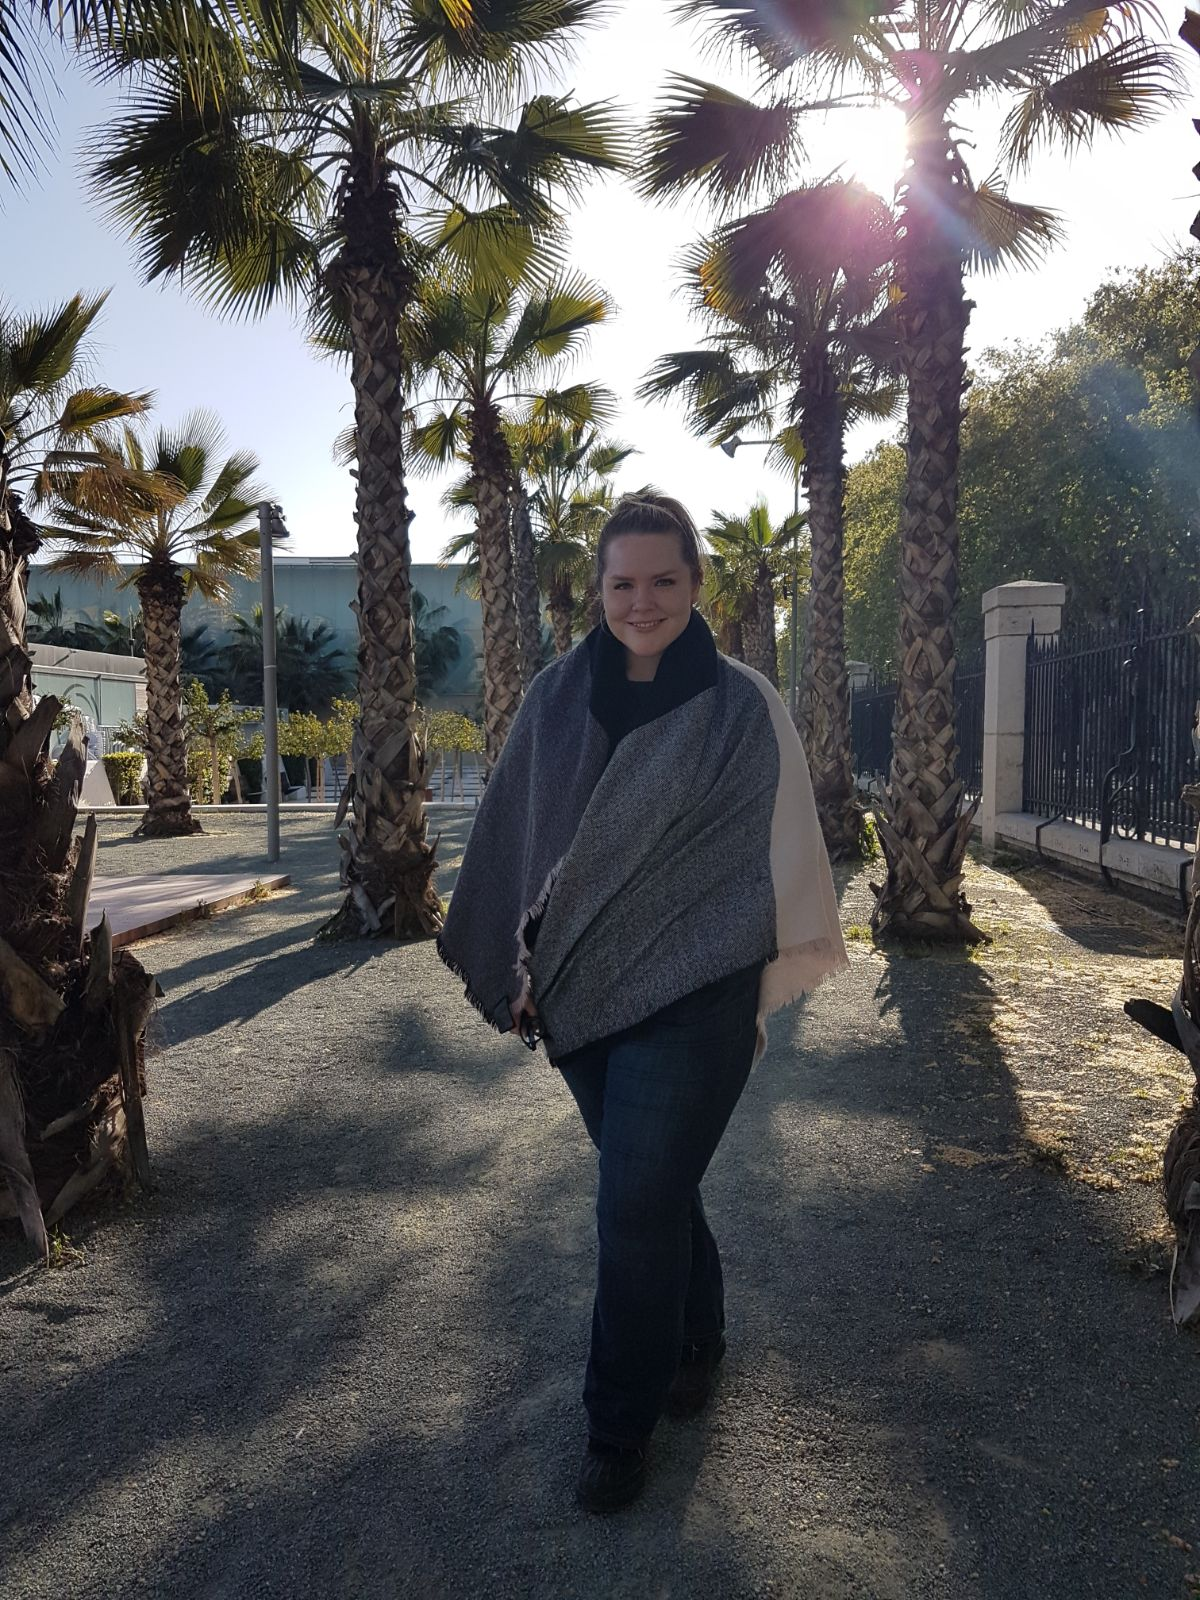 Enjoying the warm sunshine in Málaga, Spain.